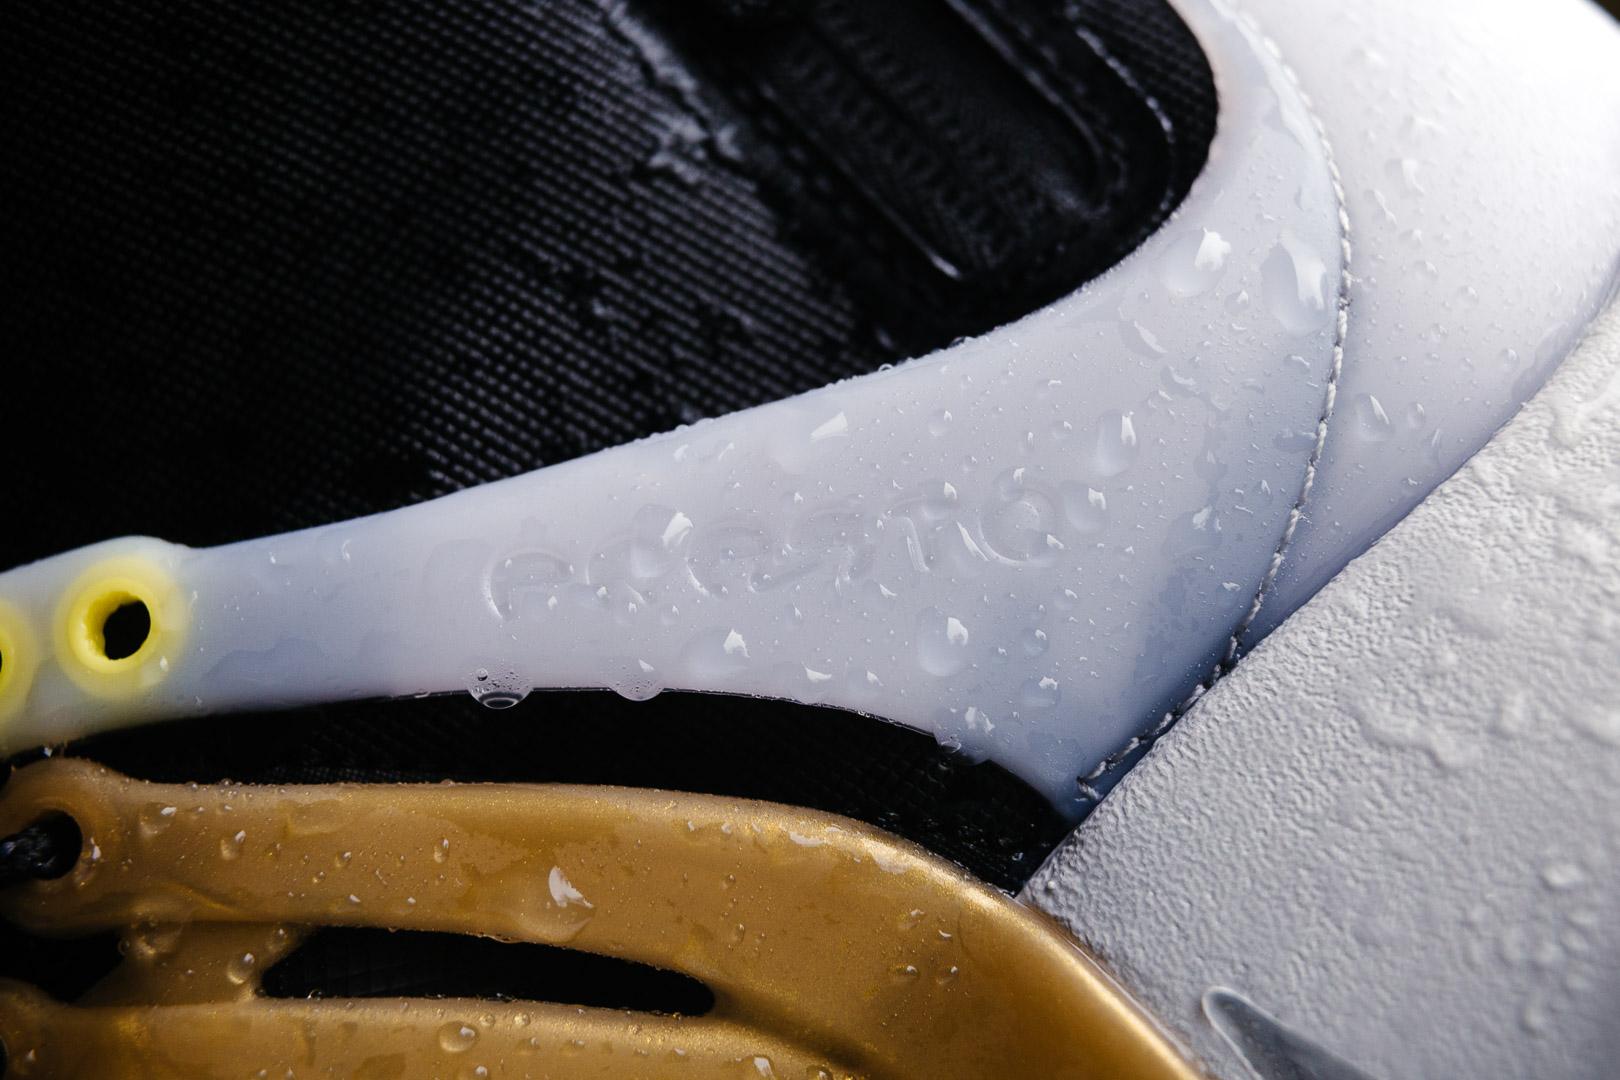 BLACK-ICE-NIKE-AIR-PRESTO-1670-INS-SoleHeaven-.jpg